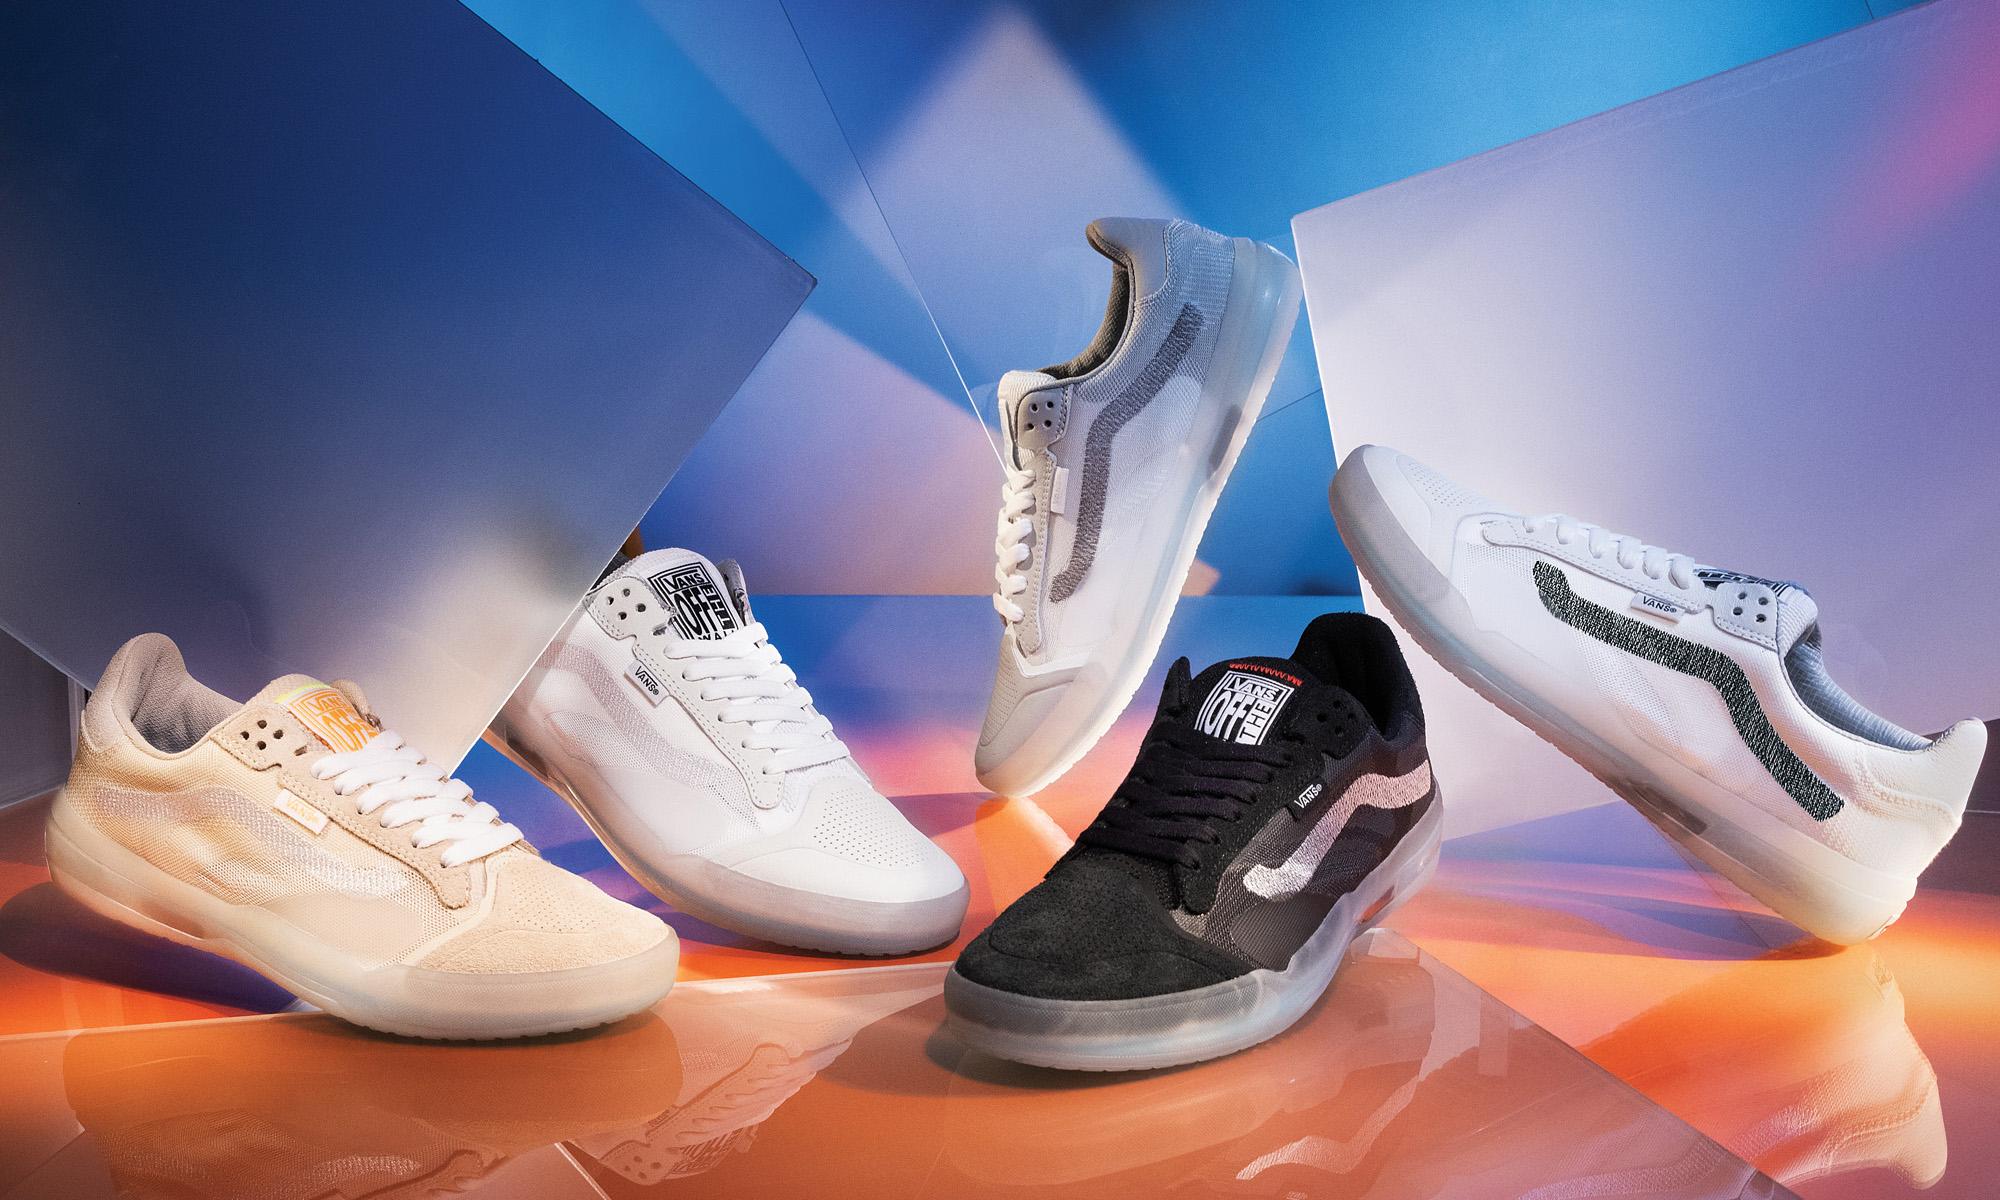 Vans 推出全新 Lifestyle 鞋型 EVDNT UltimateWaffle